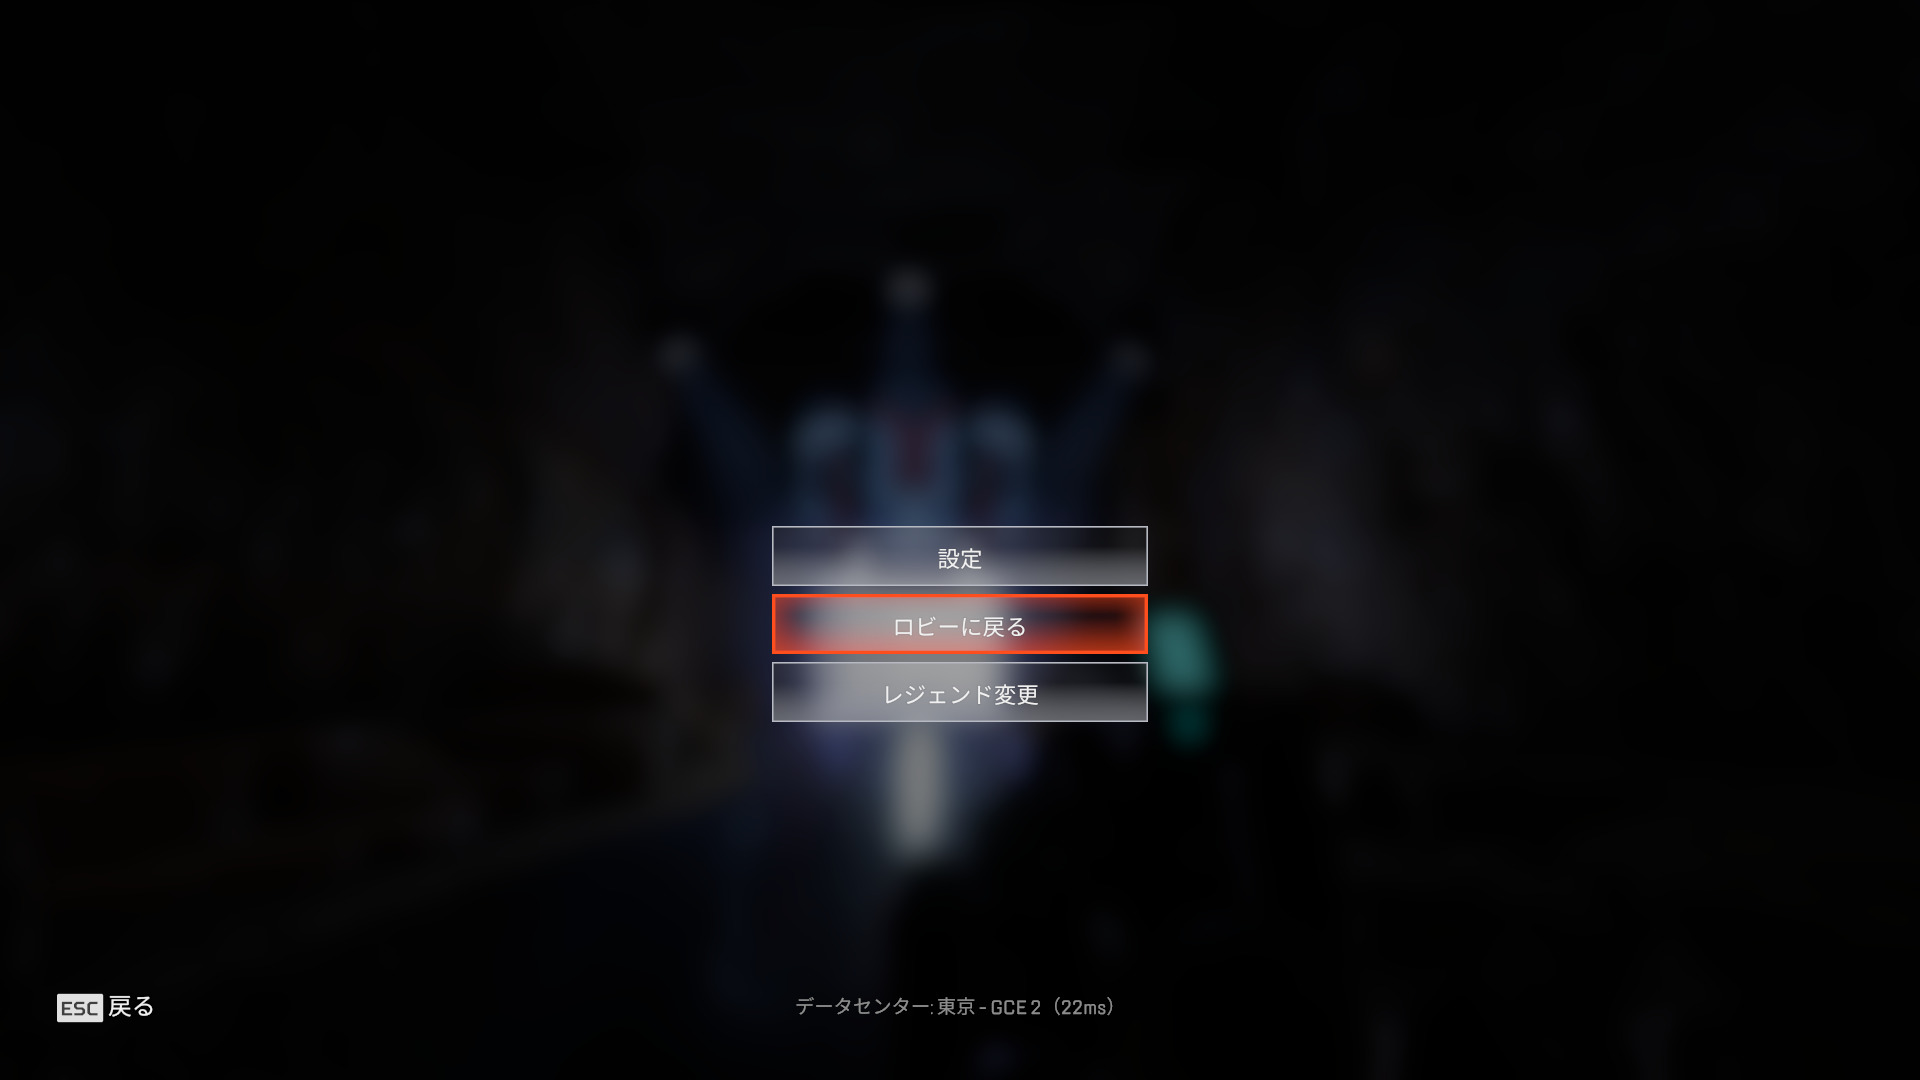 【Apex Legends】射撃練習場でBot(ダミー)を動かす方法【エーペックスレジェンズ】